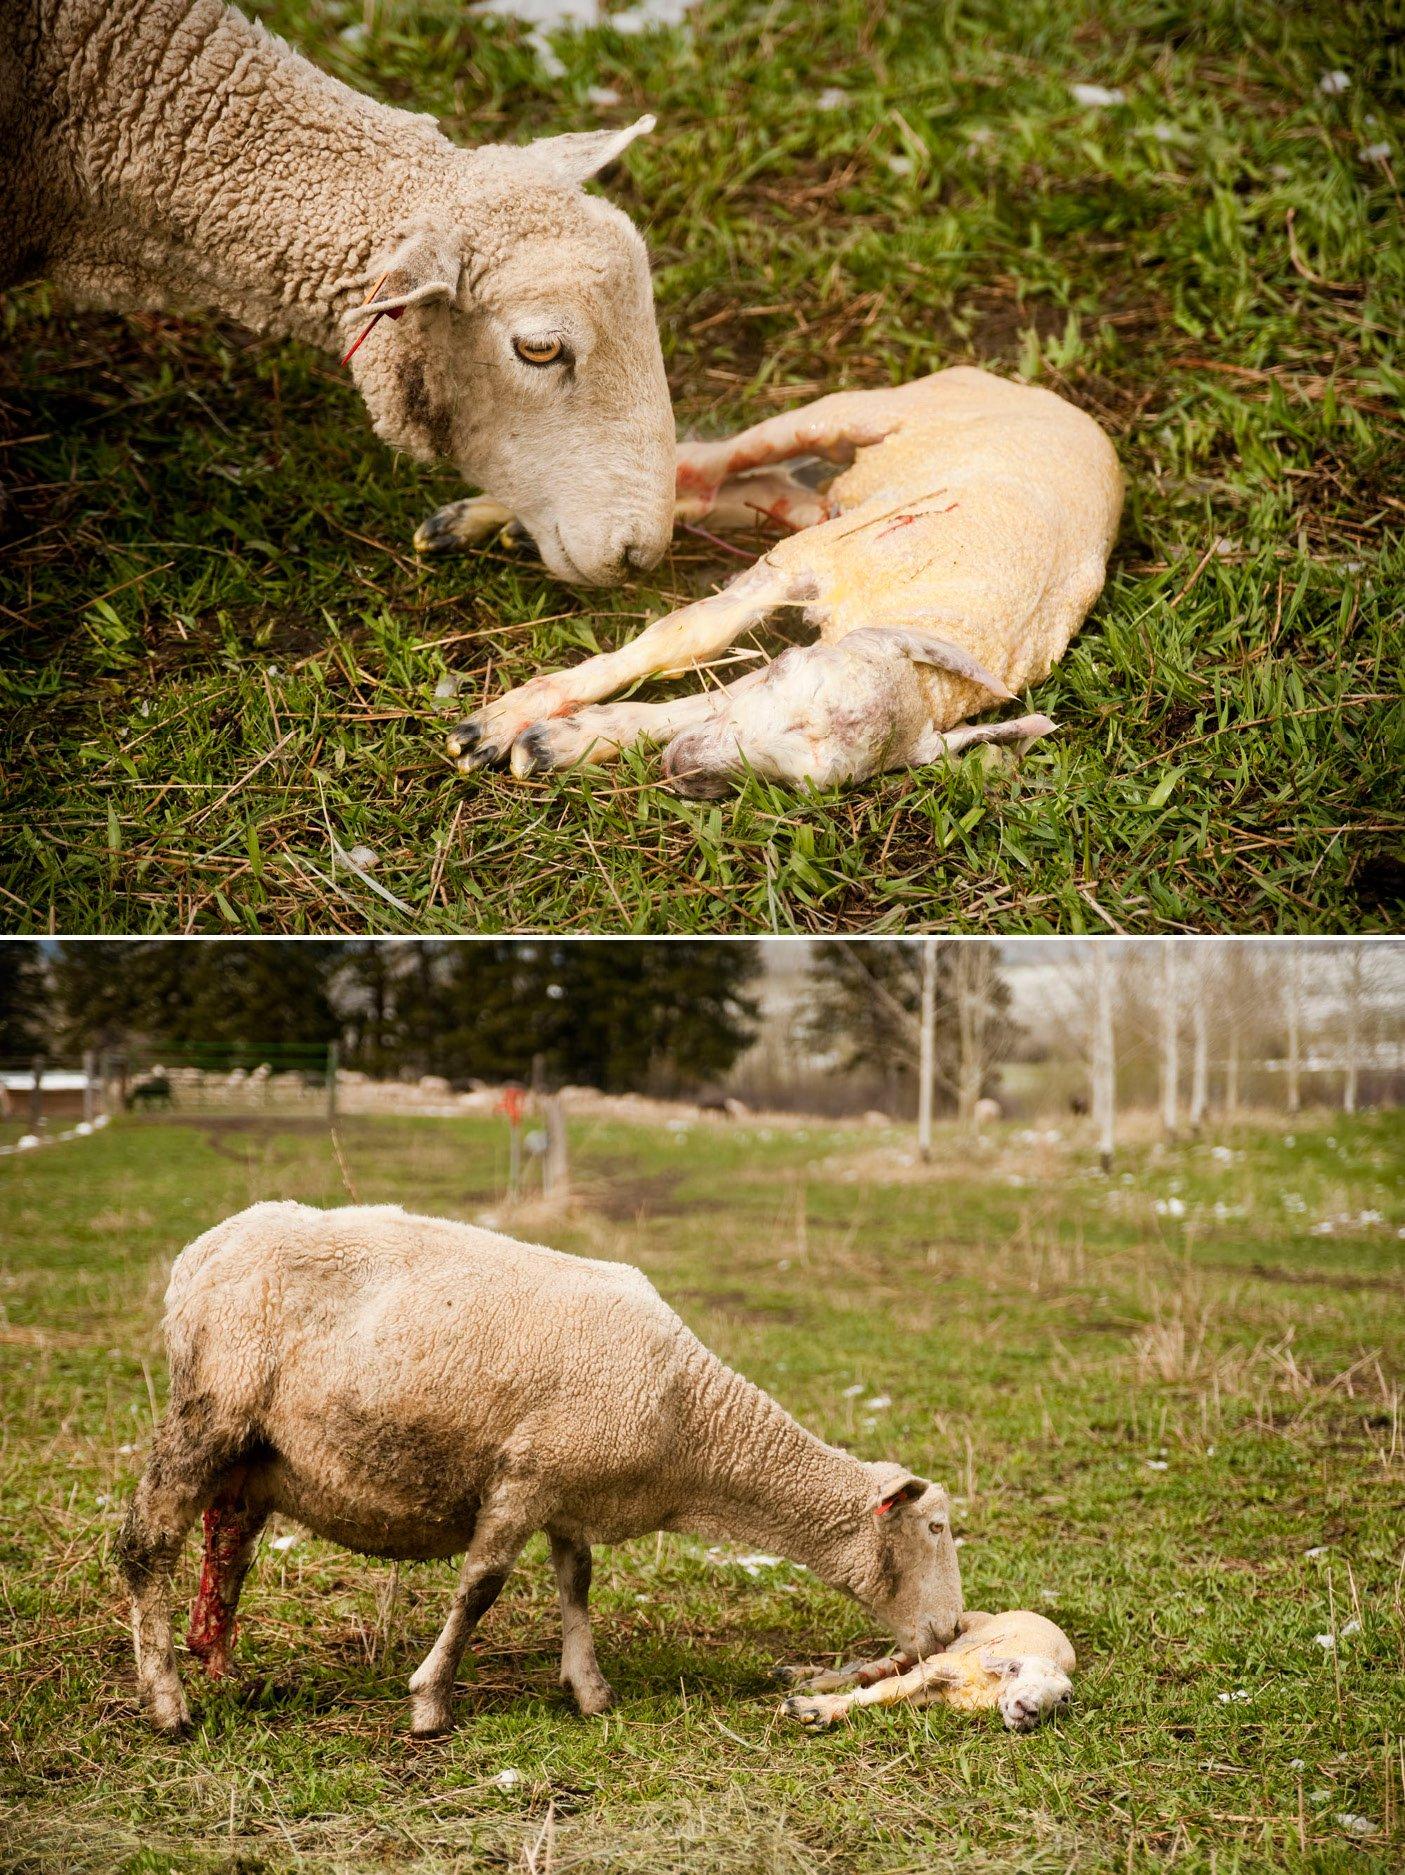 newborn-lamb-with-mom